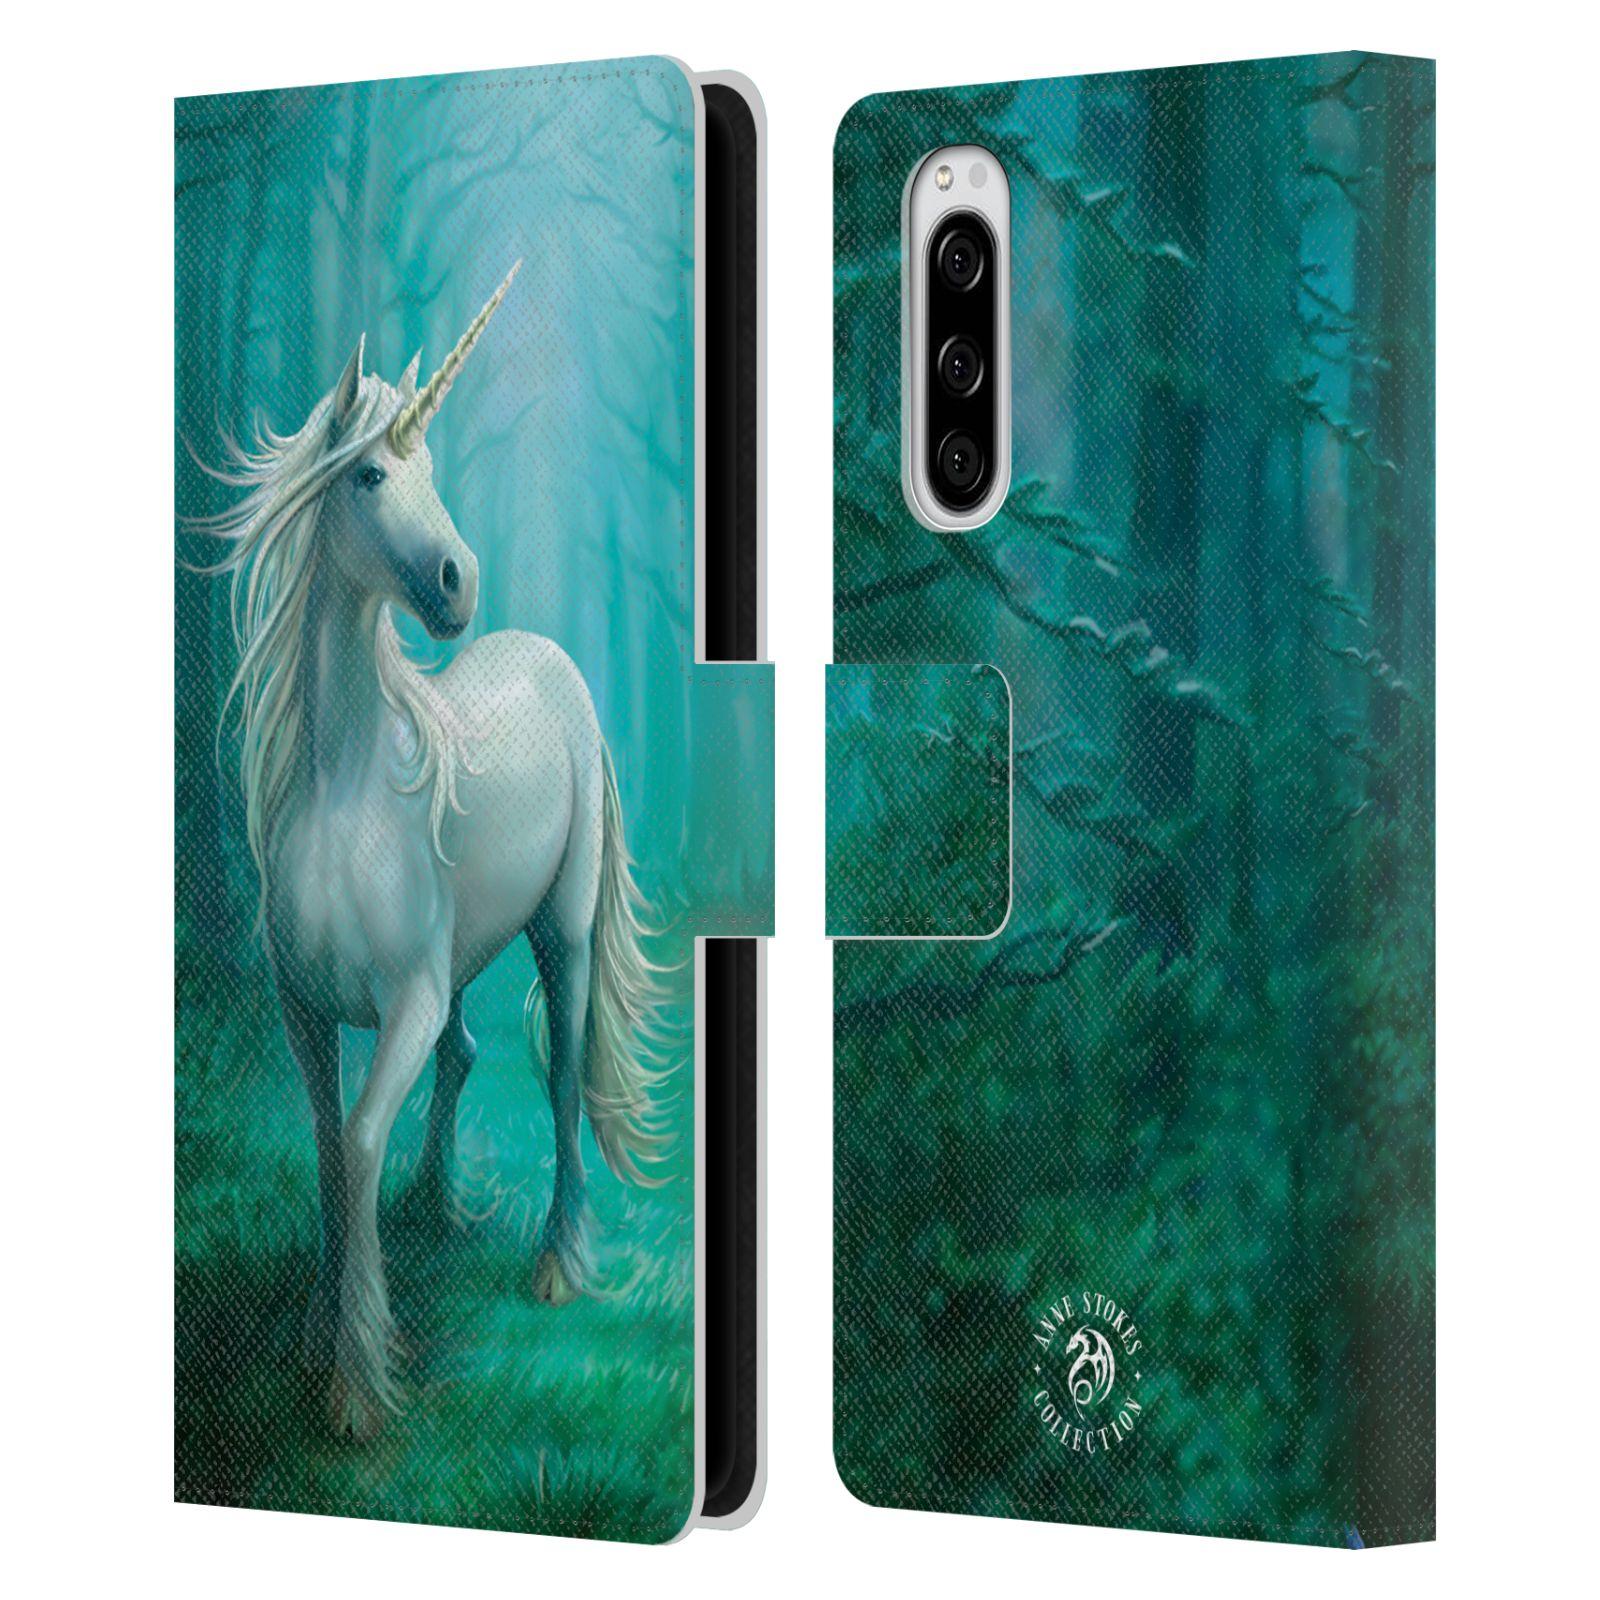 Pouzdro na mobil Sony Xperia 5 - Head Case - fantasy - jednorožec v lese